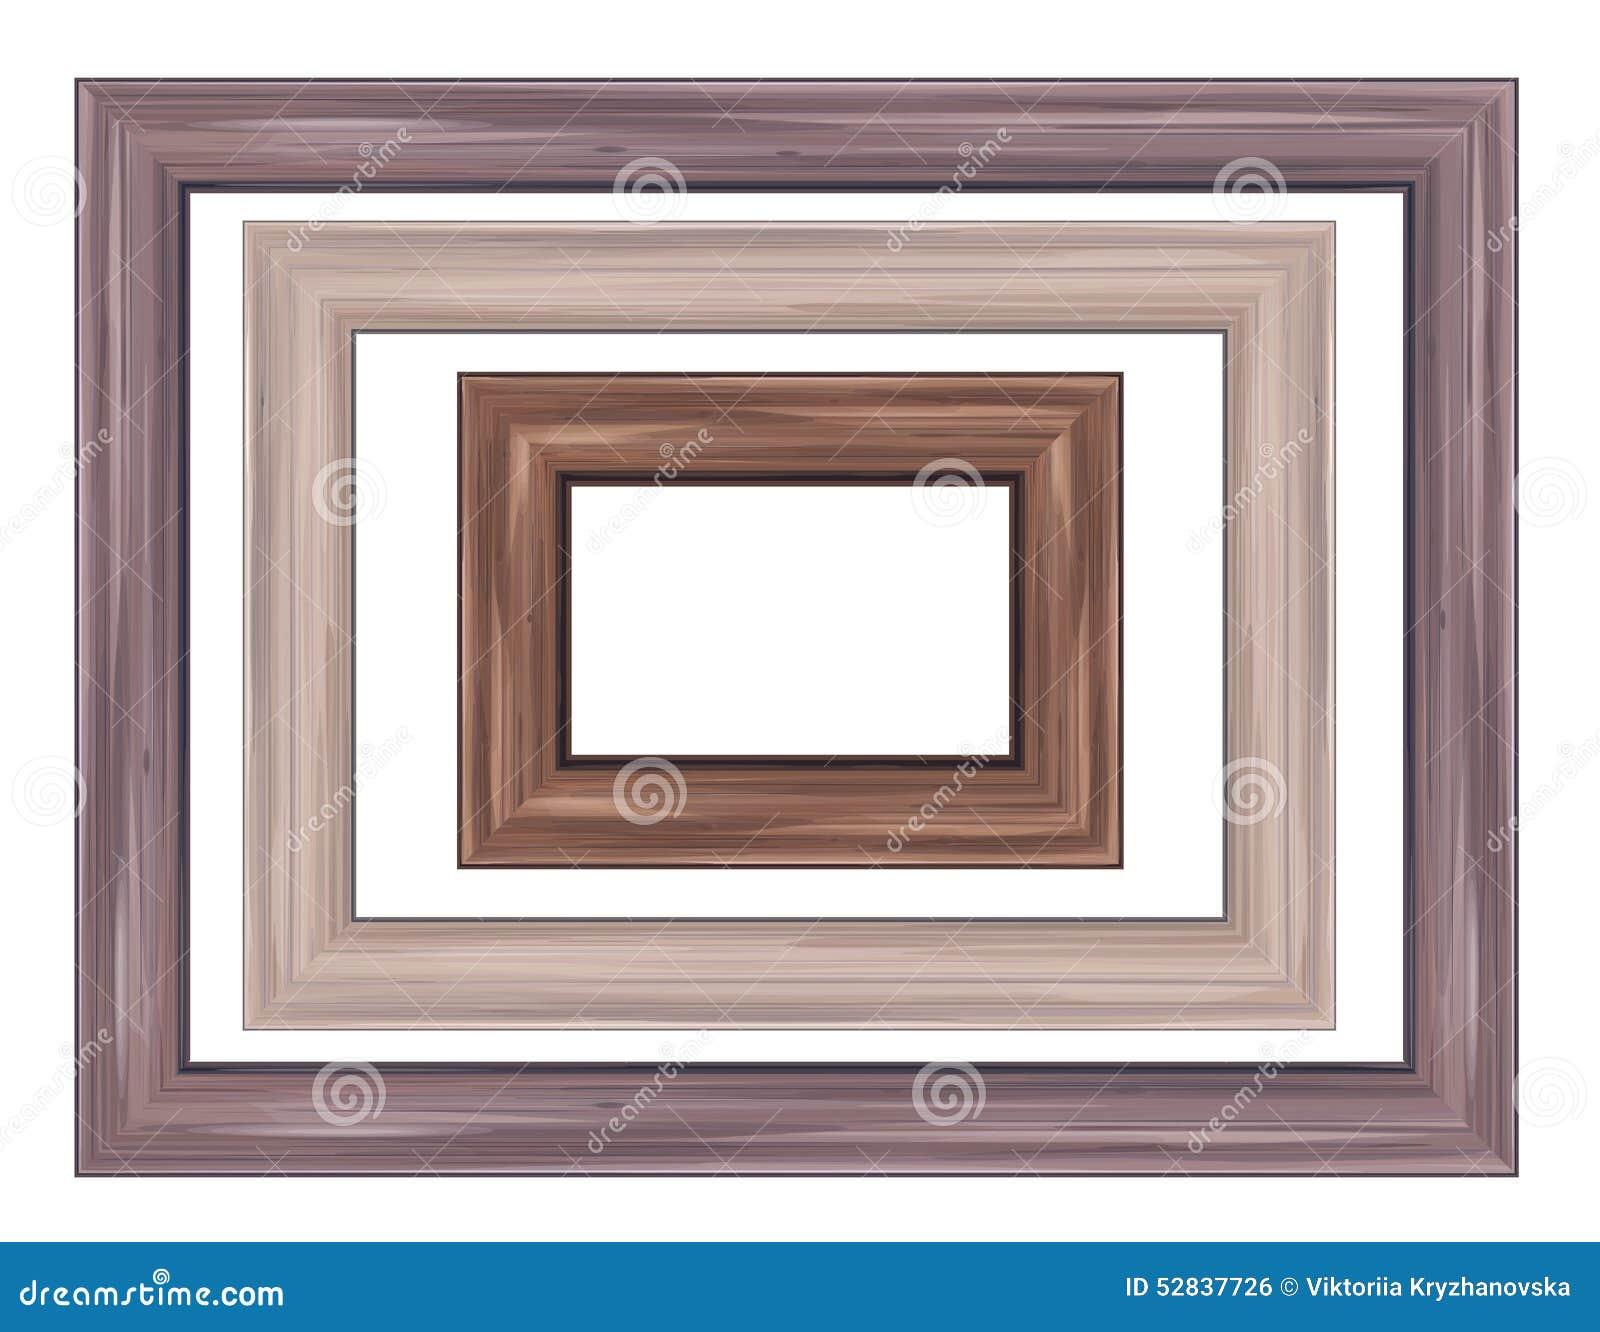 Wood frames set free vector - Royalty Free Vector Brown Frames Wooden